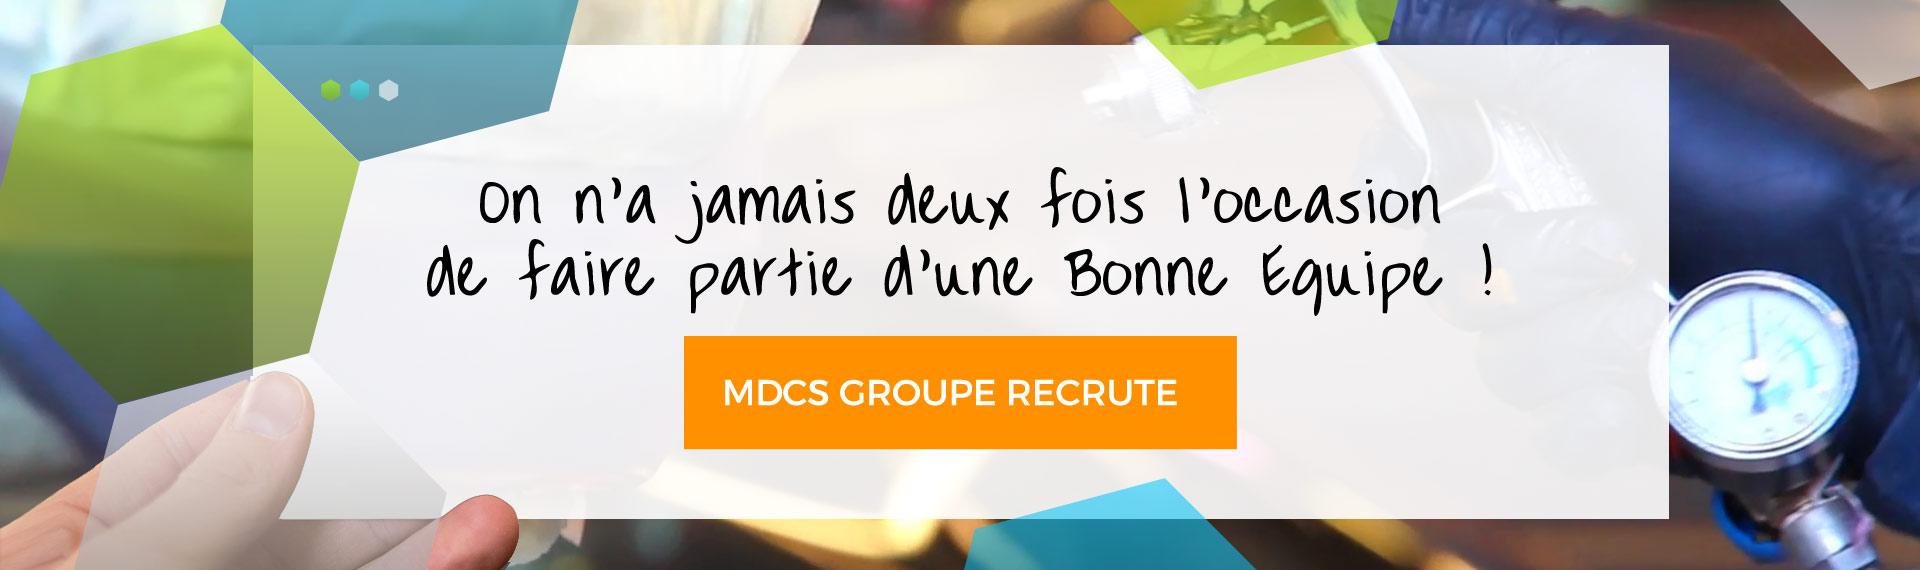 MDCS Groupe recrute 5 Techniciens Peintres Raccord